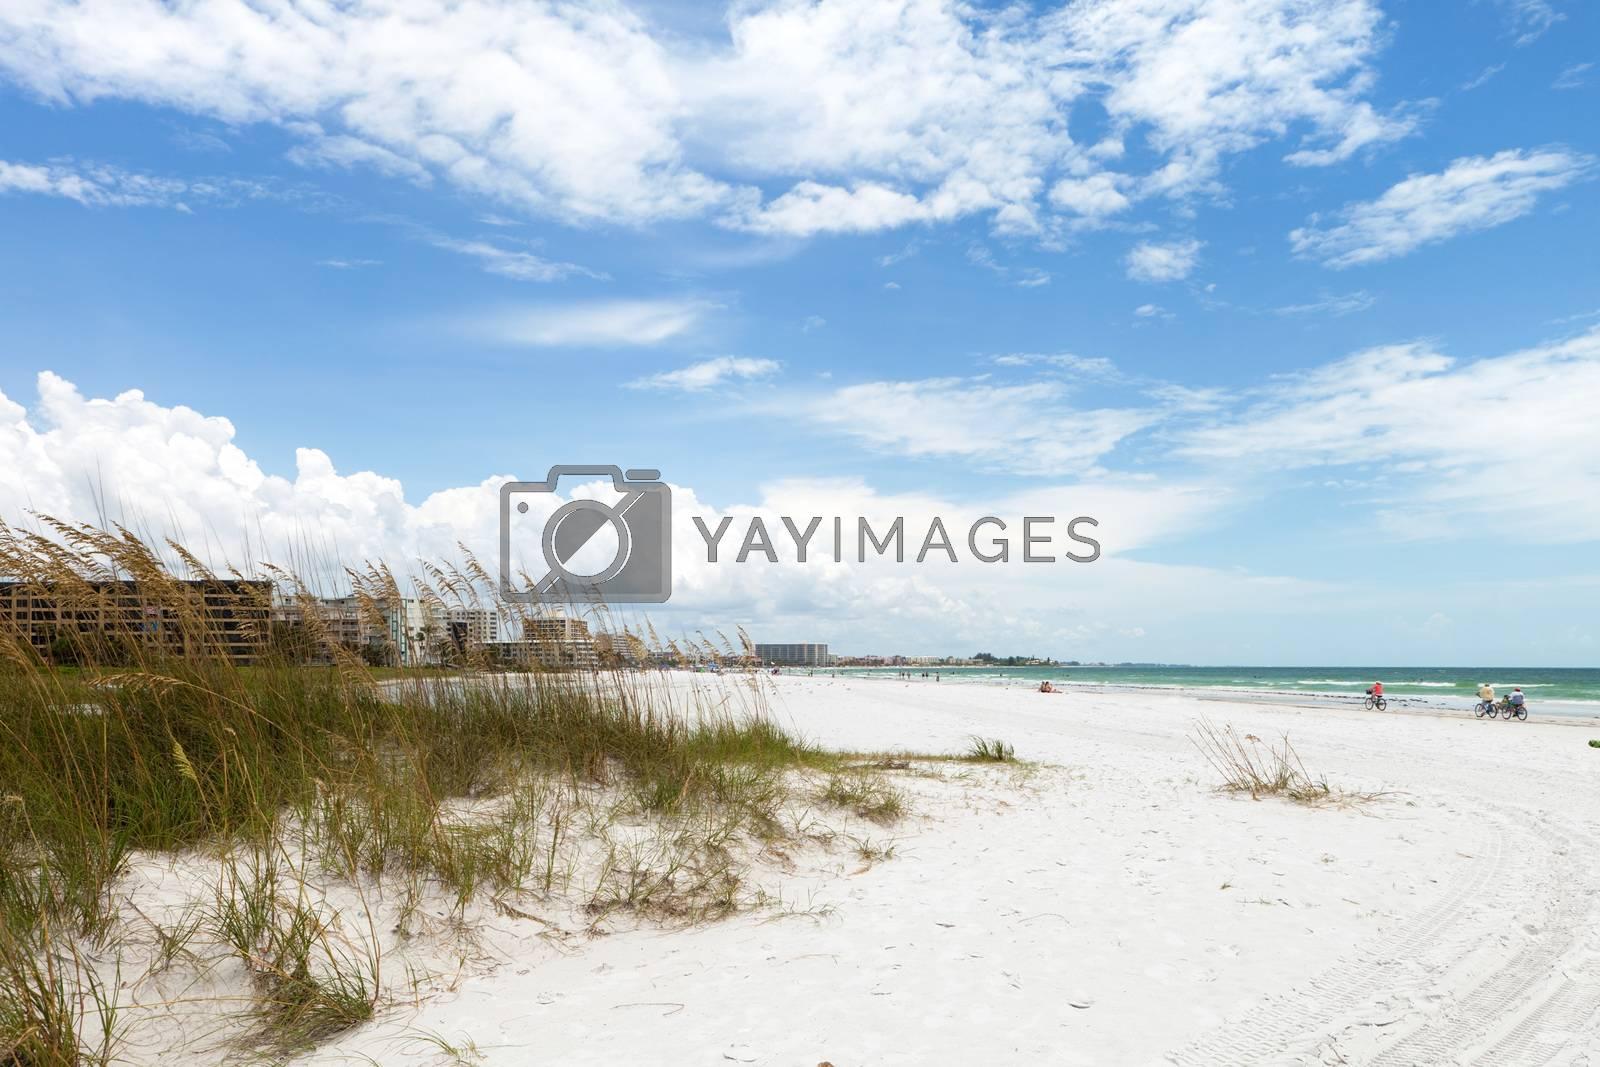 Royalty free image of Siesta Key Beach Sarasota Florida by graficallyminded